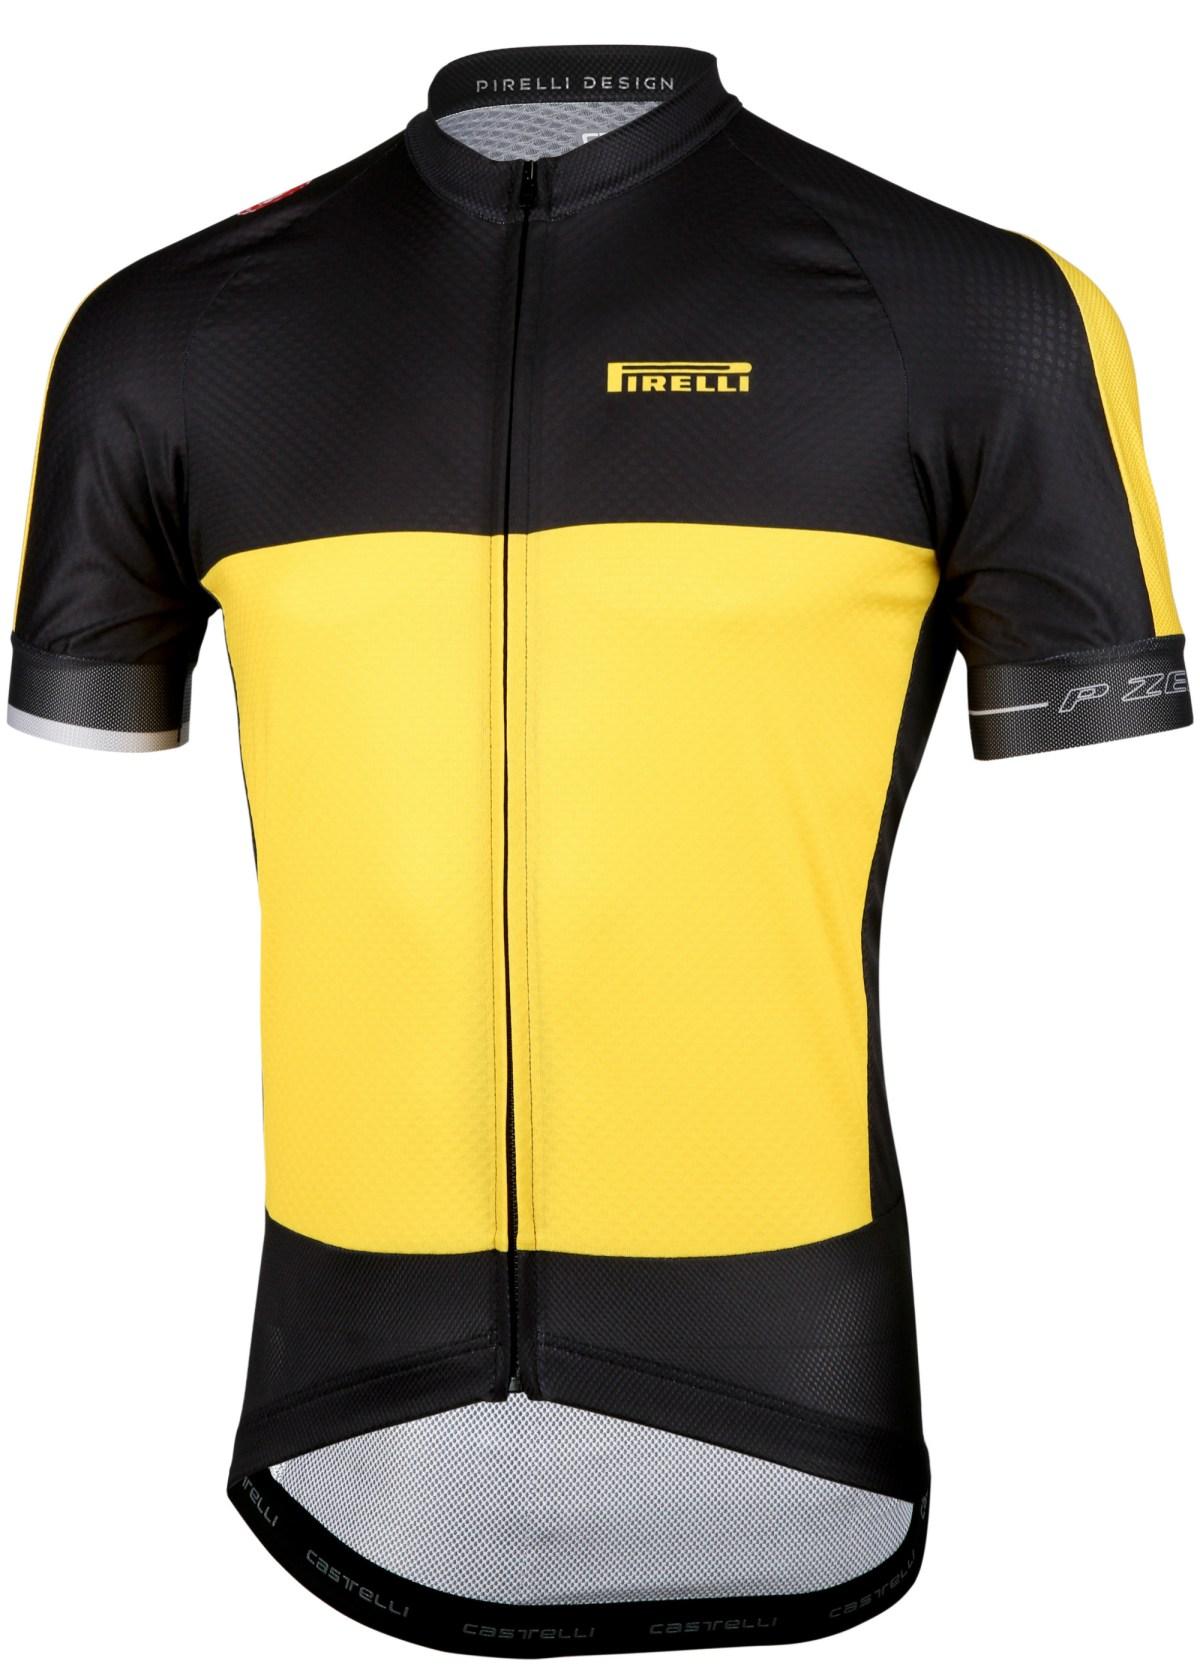 Pirelli Design Technical Cycling Jersey